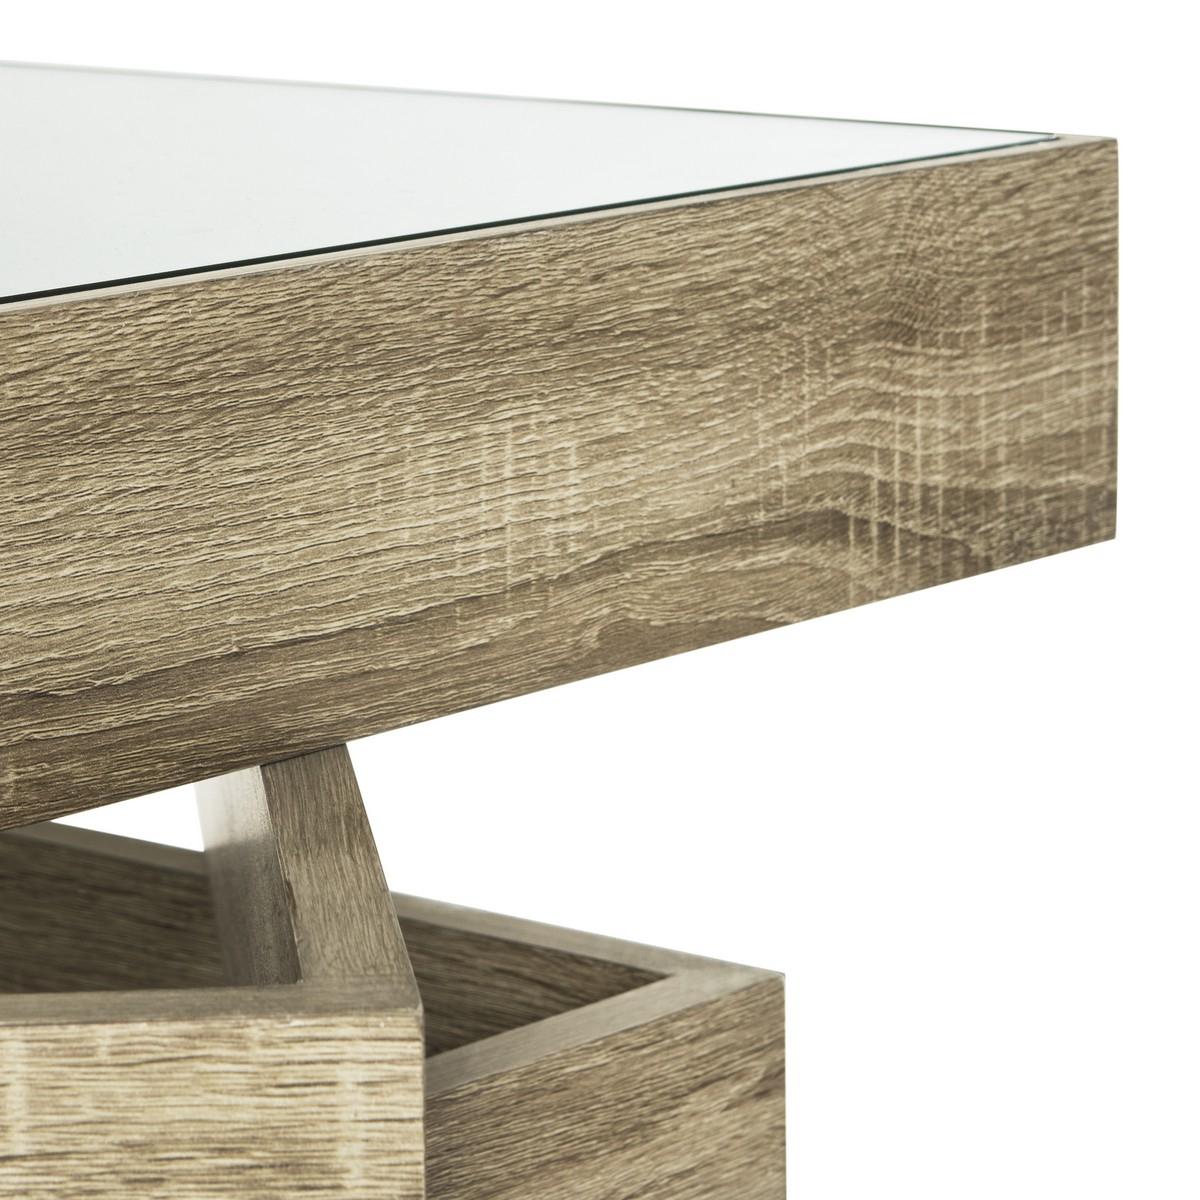 Fox4250a Coffee Tables – Furnituresafavieh For Latest Safavieh Anwen Geometric Wood Coffee Tables (View 6 of 20)